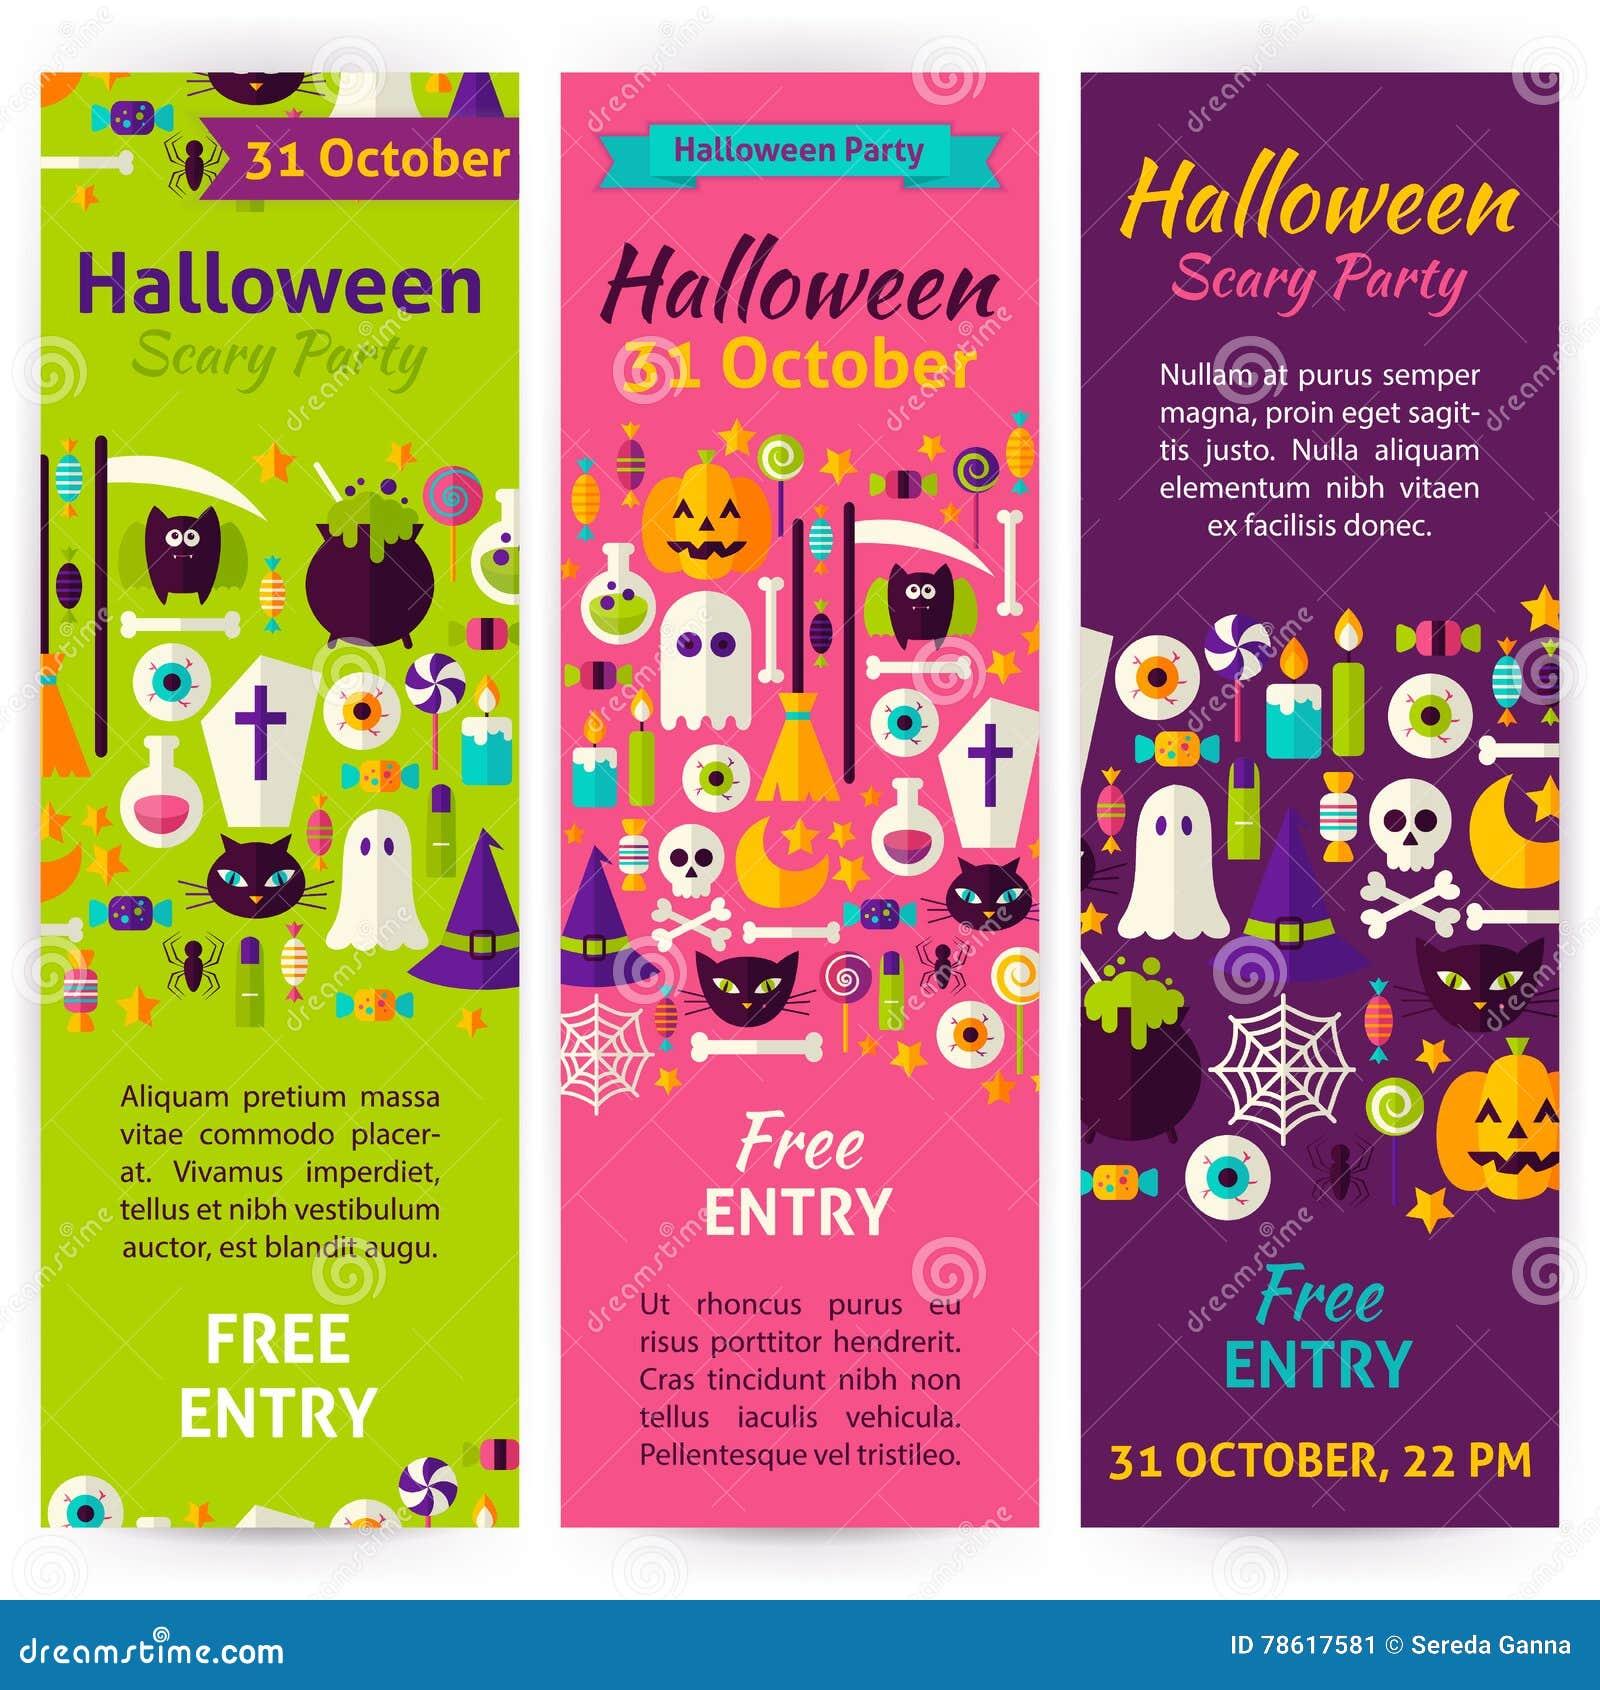 halloween party free flyer psd template by elegantflyer. halloween ...